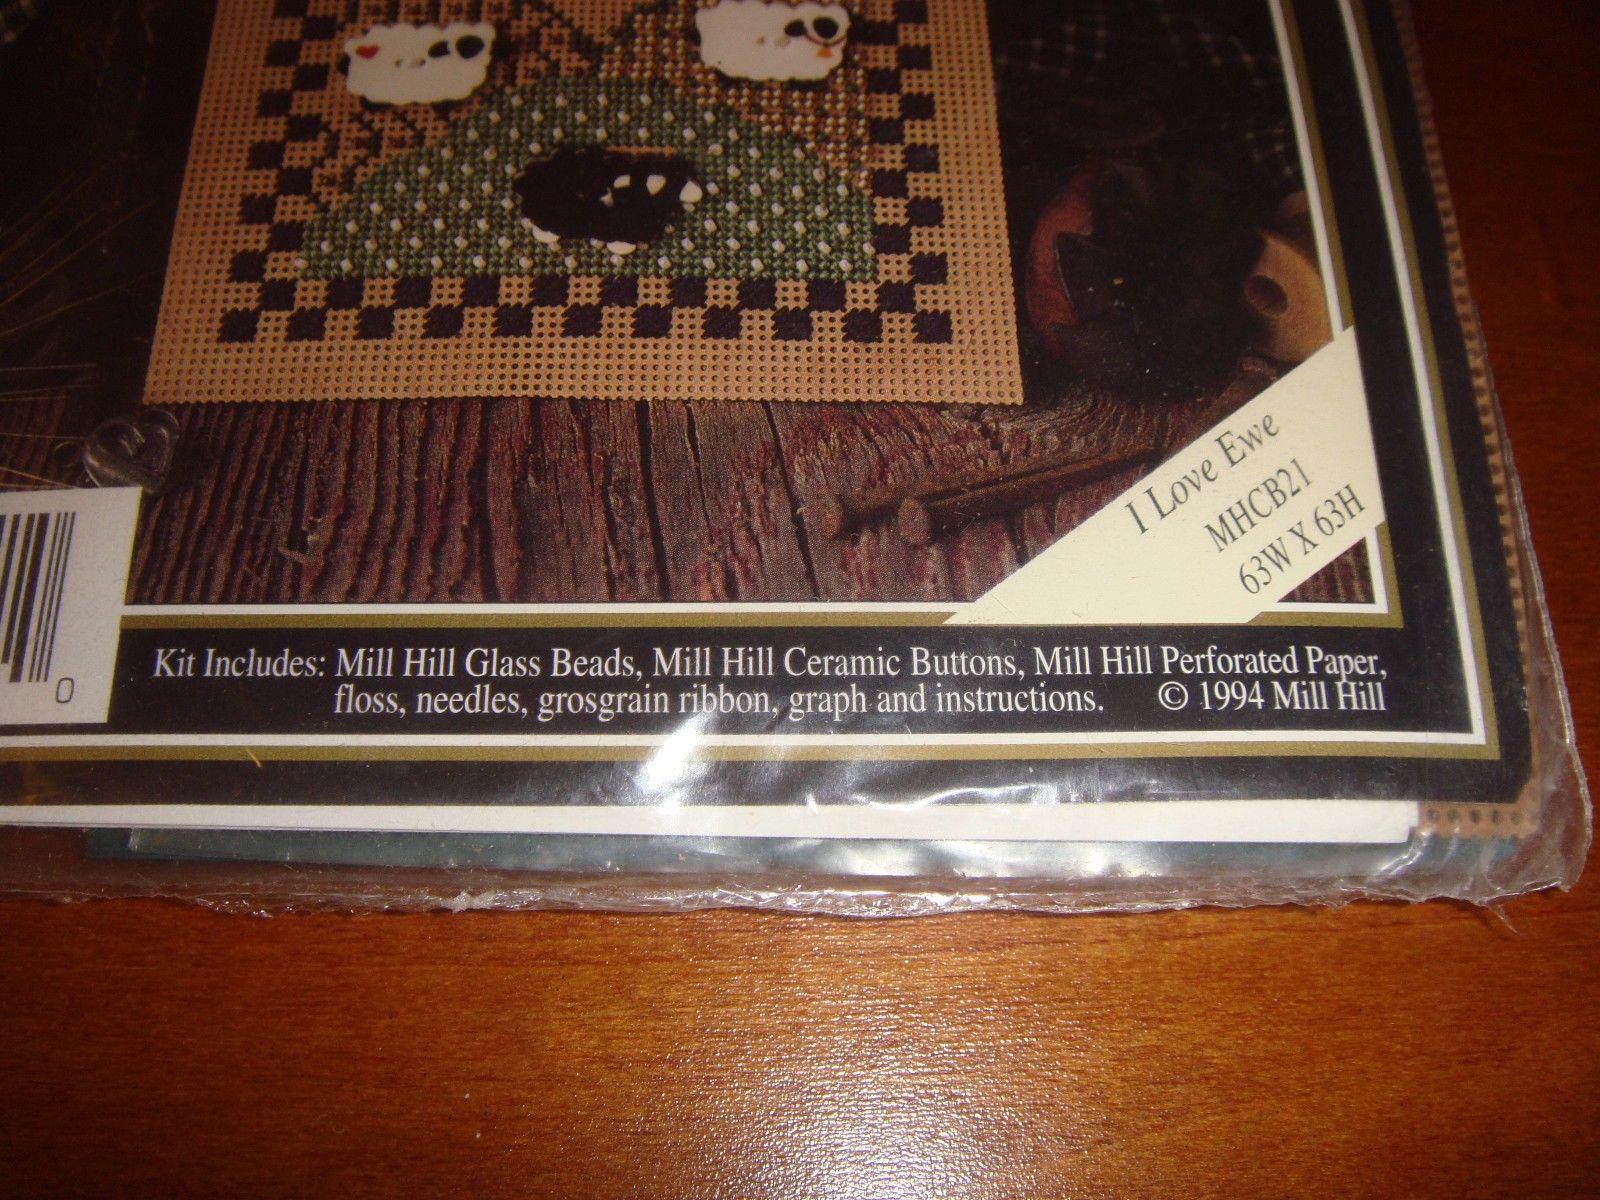 Mill Hill I Love Ewe Checkerboard Series I Cross Stitch Kit image 2